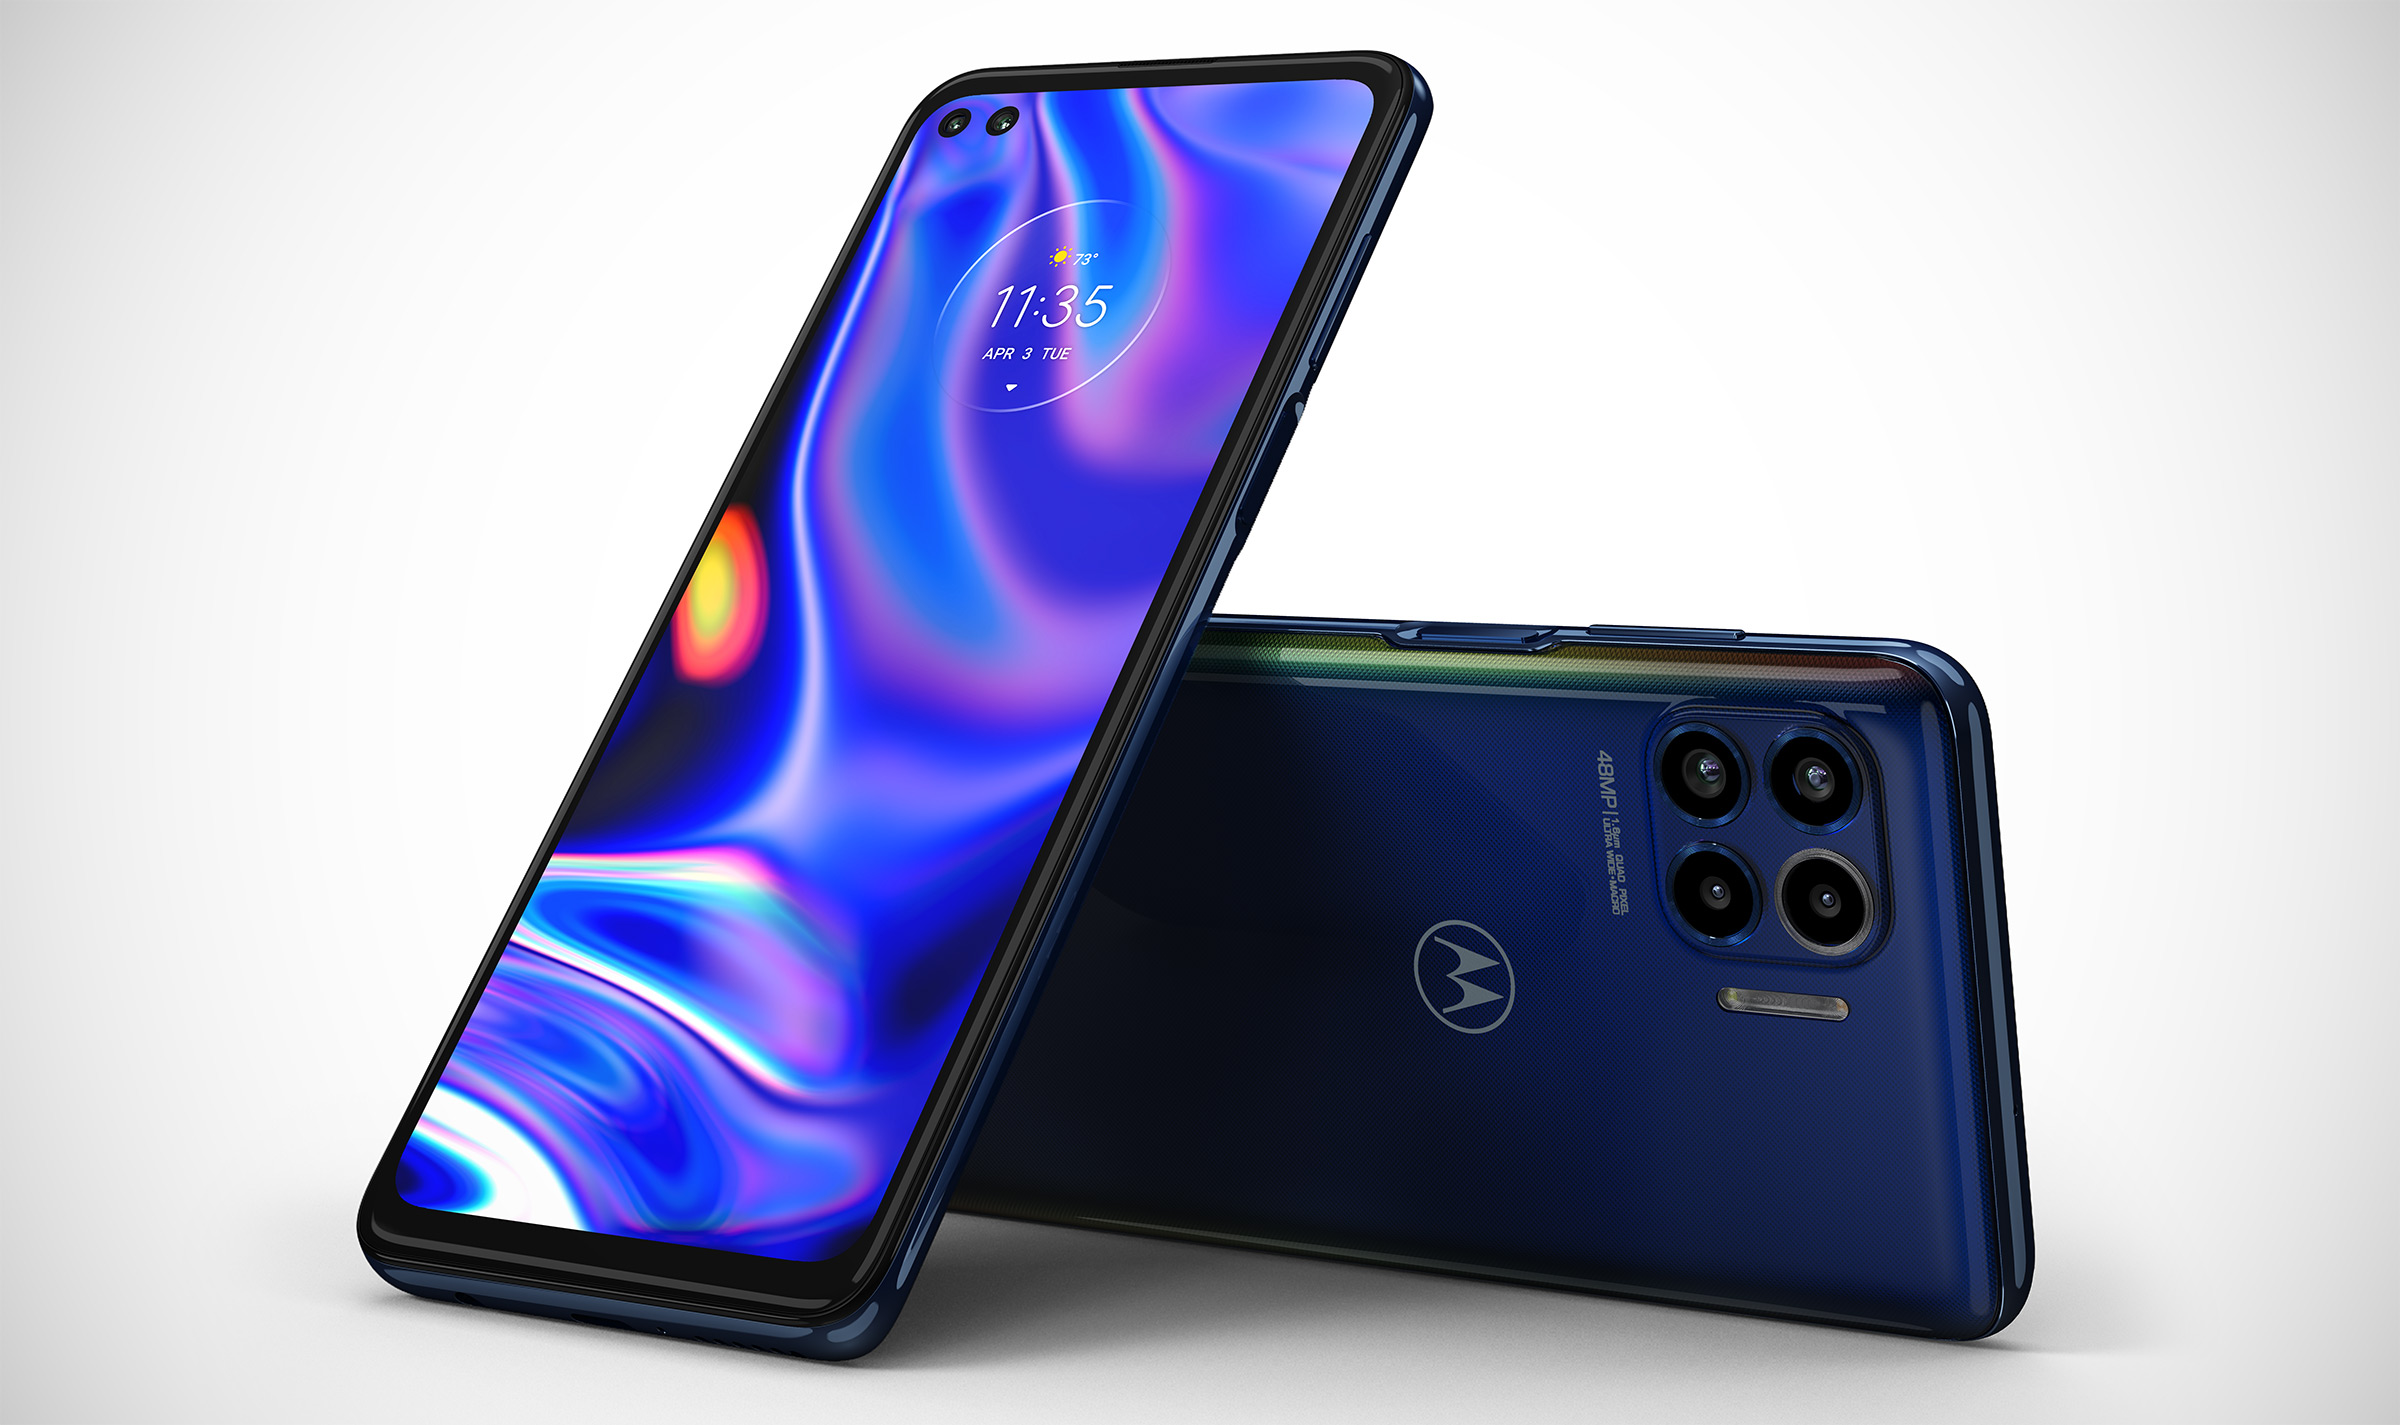 Motorola's latest mid-range phone is a sub-$500 stunner with 5G #rwanda #RwOT ベディ